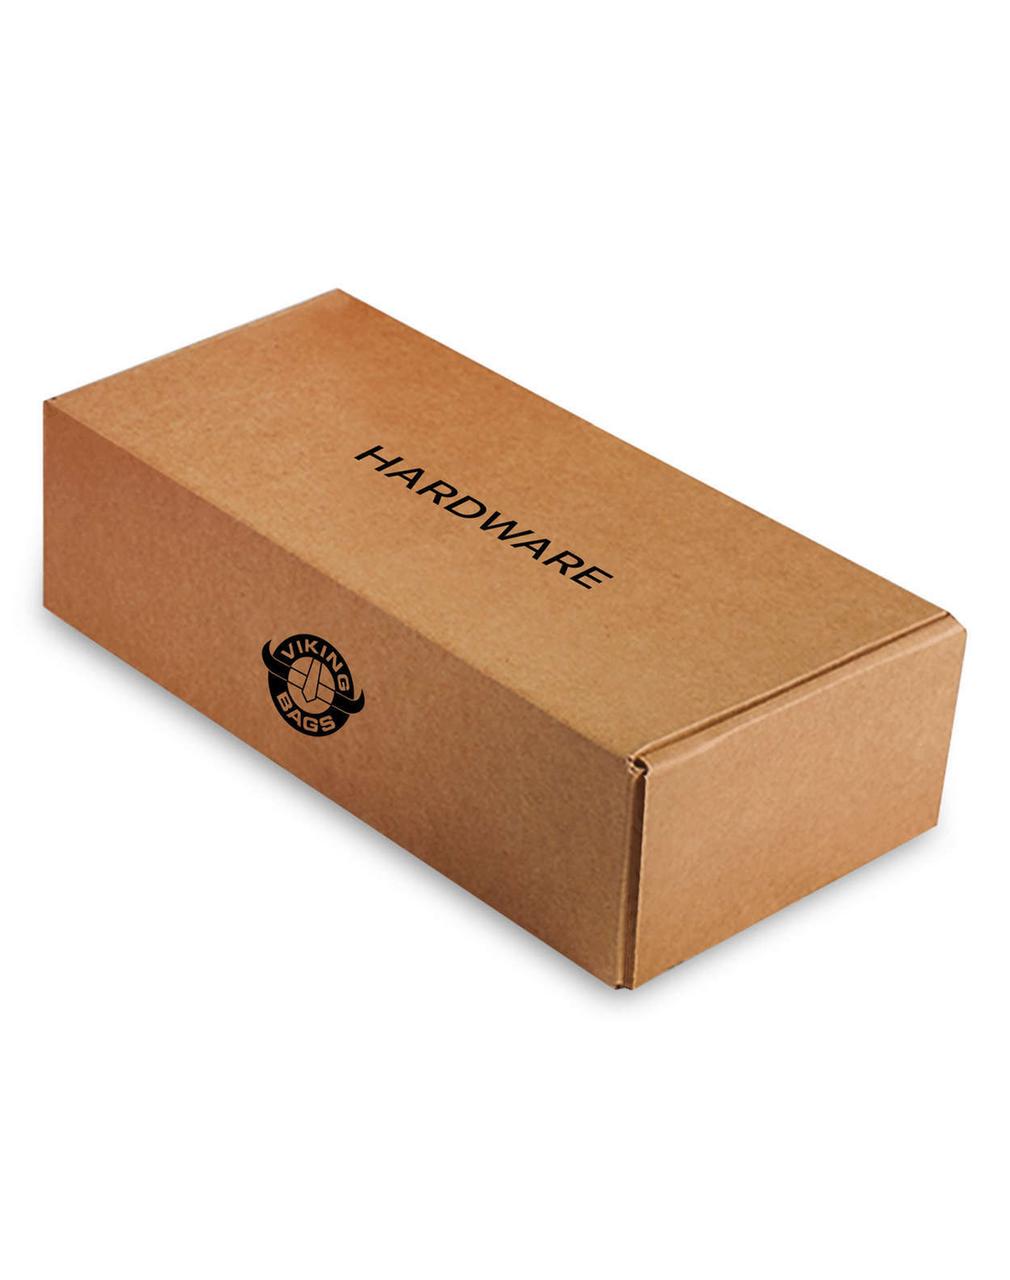 Honda Magna 750 Side Pocket Motorcycle Saddlebags box